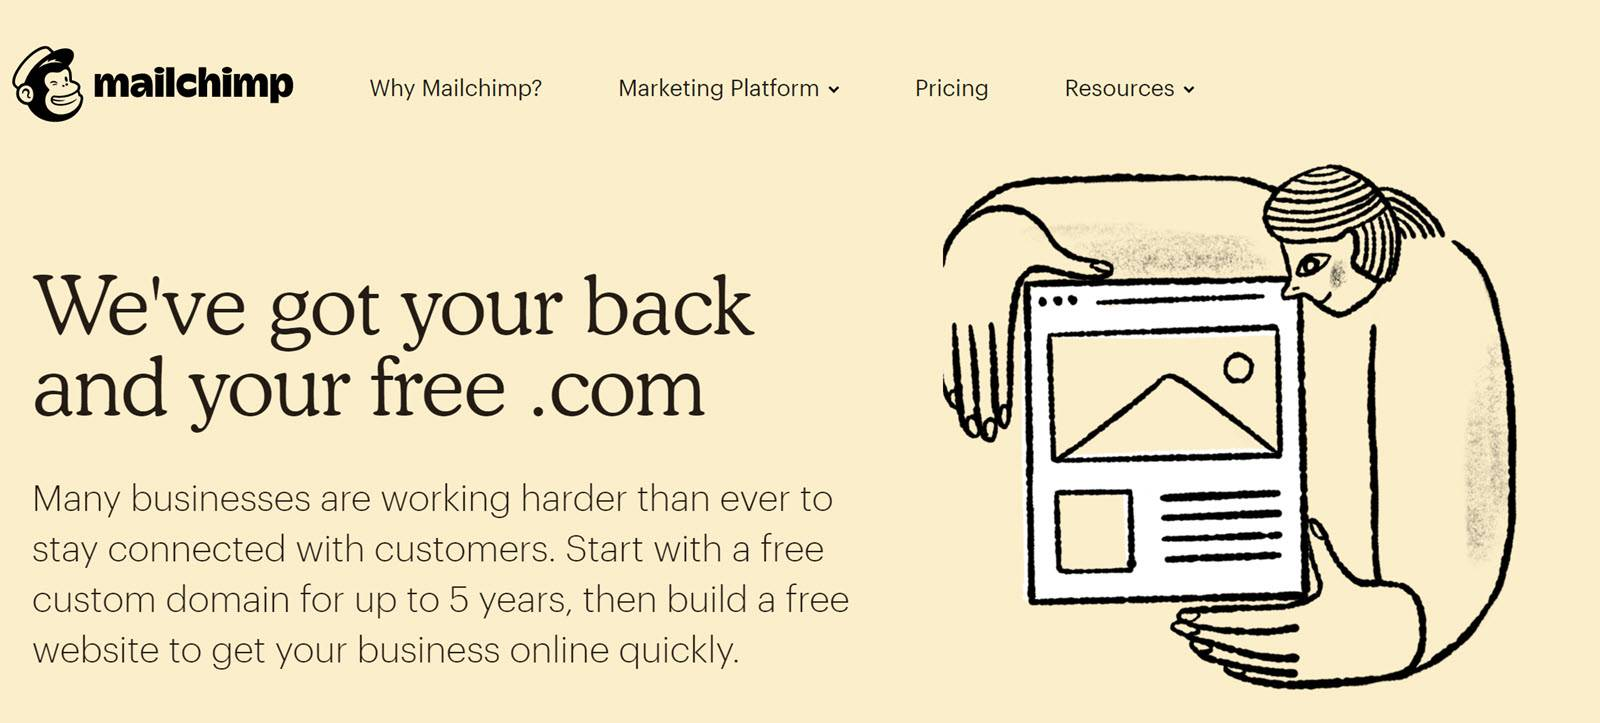 Best CRM Email Marketing Automation Platform - Mailchimp